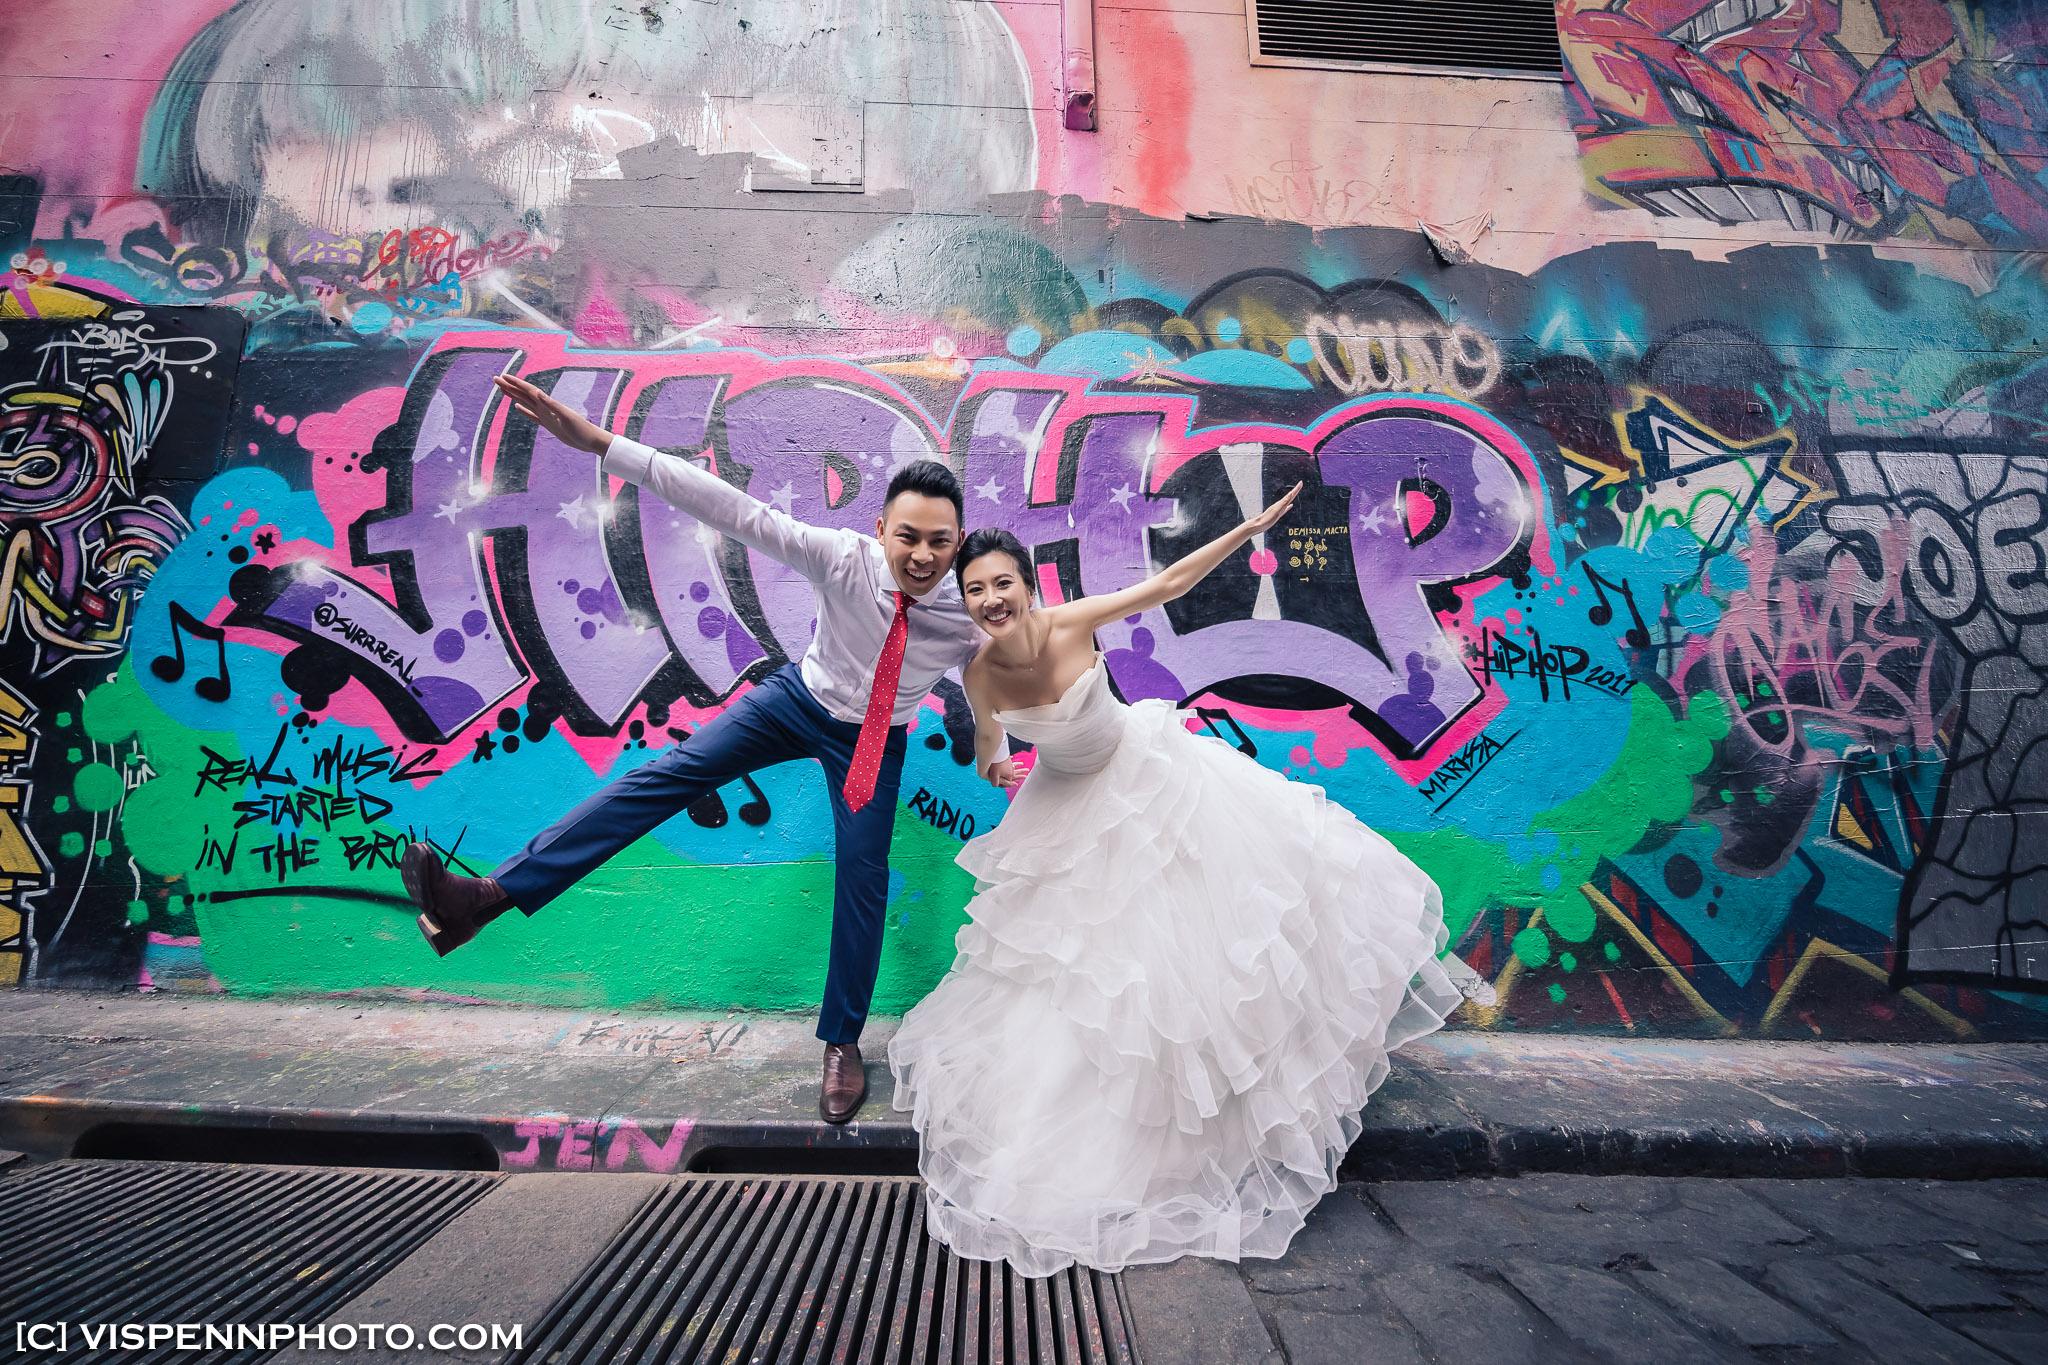 PRE WEDDING Photography Melbourne VISPENN 墨尔本 婚纱照 结婚照 婚纱摄影 VISPENN P1 0962